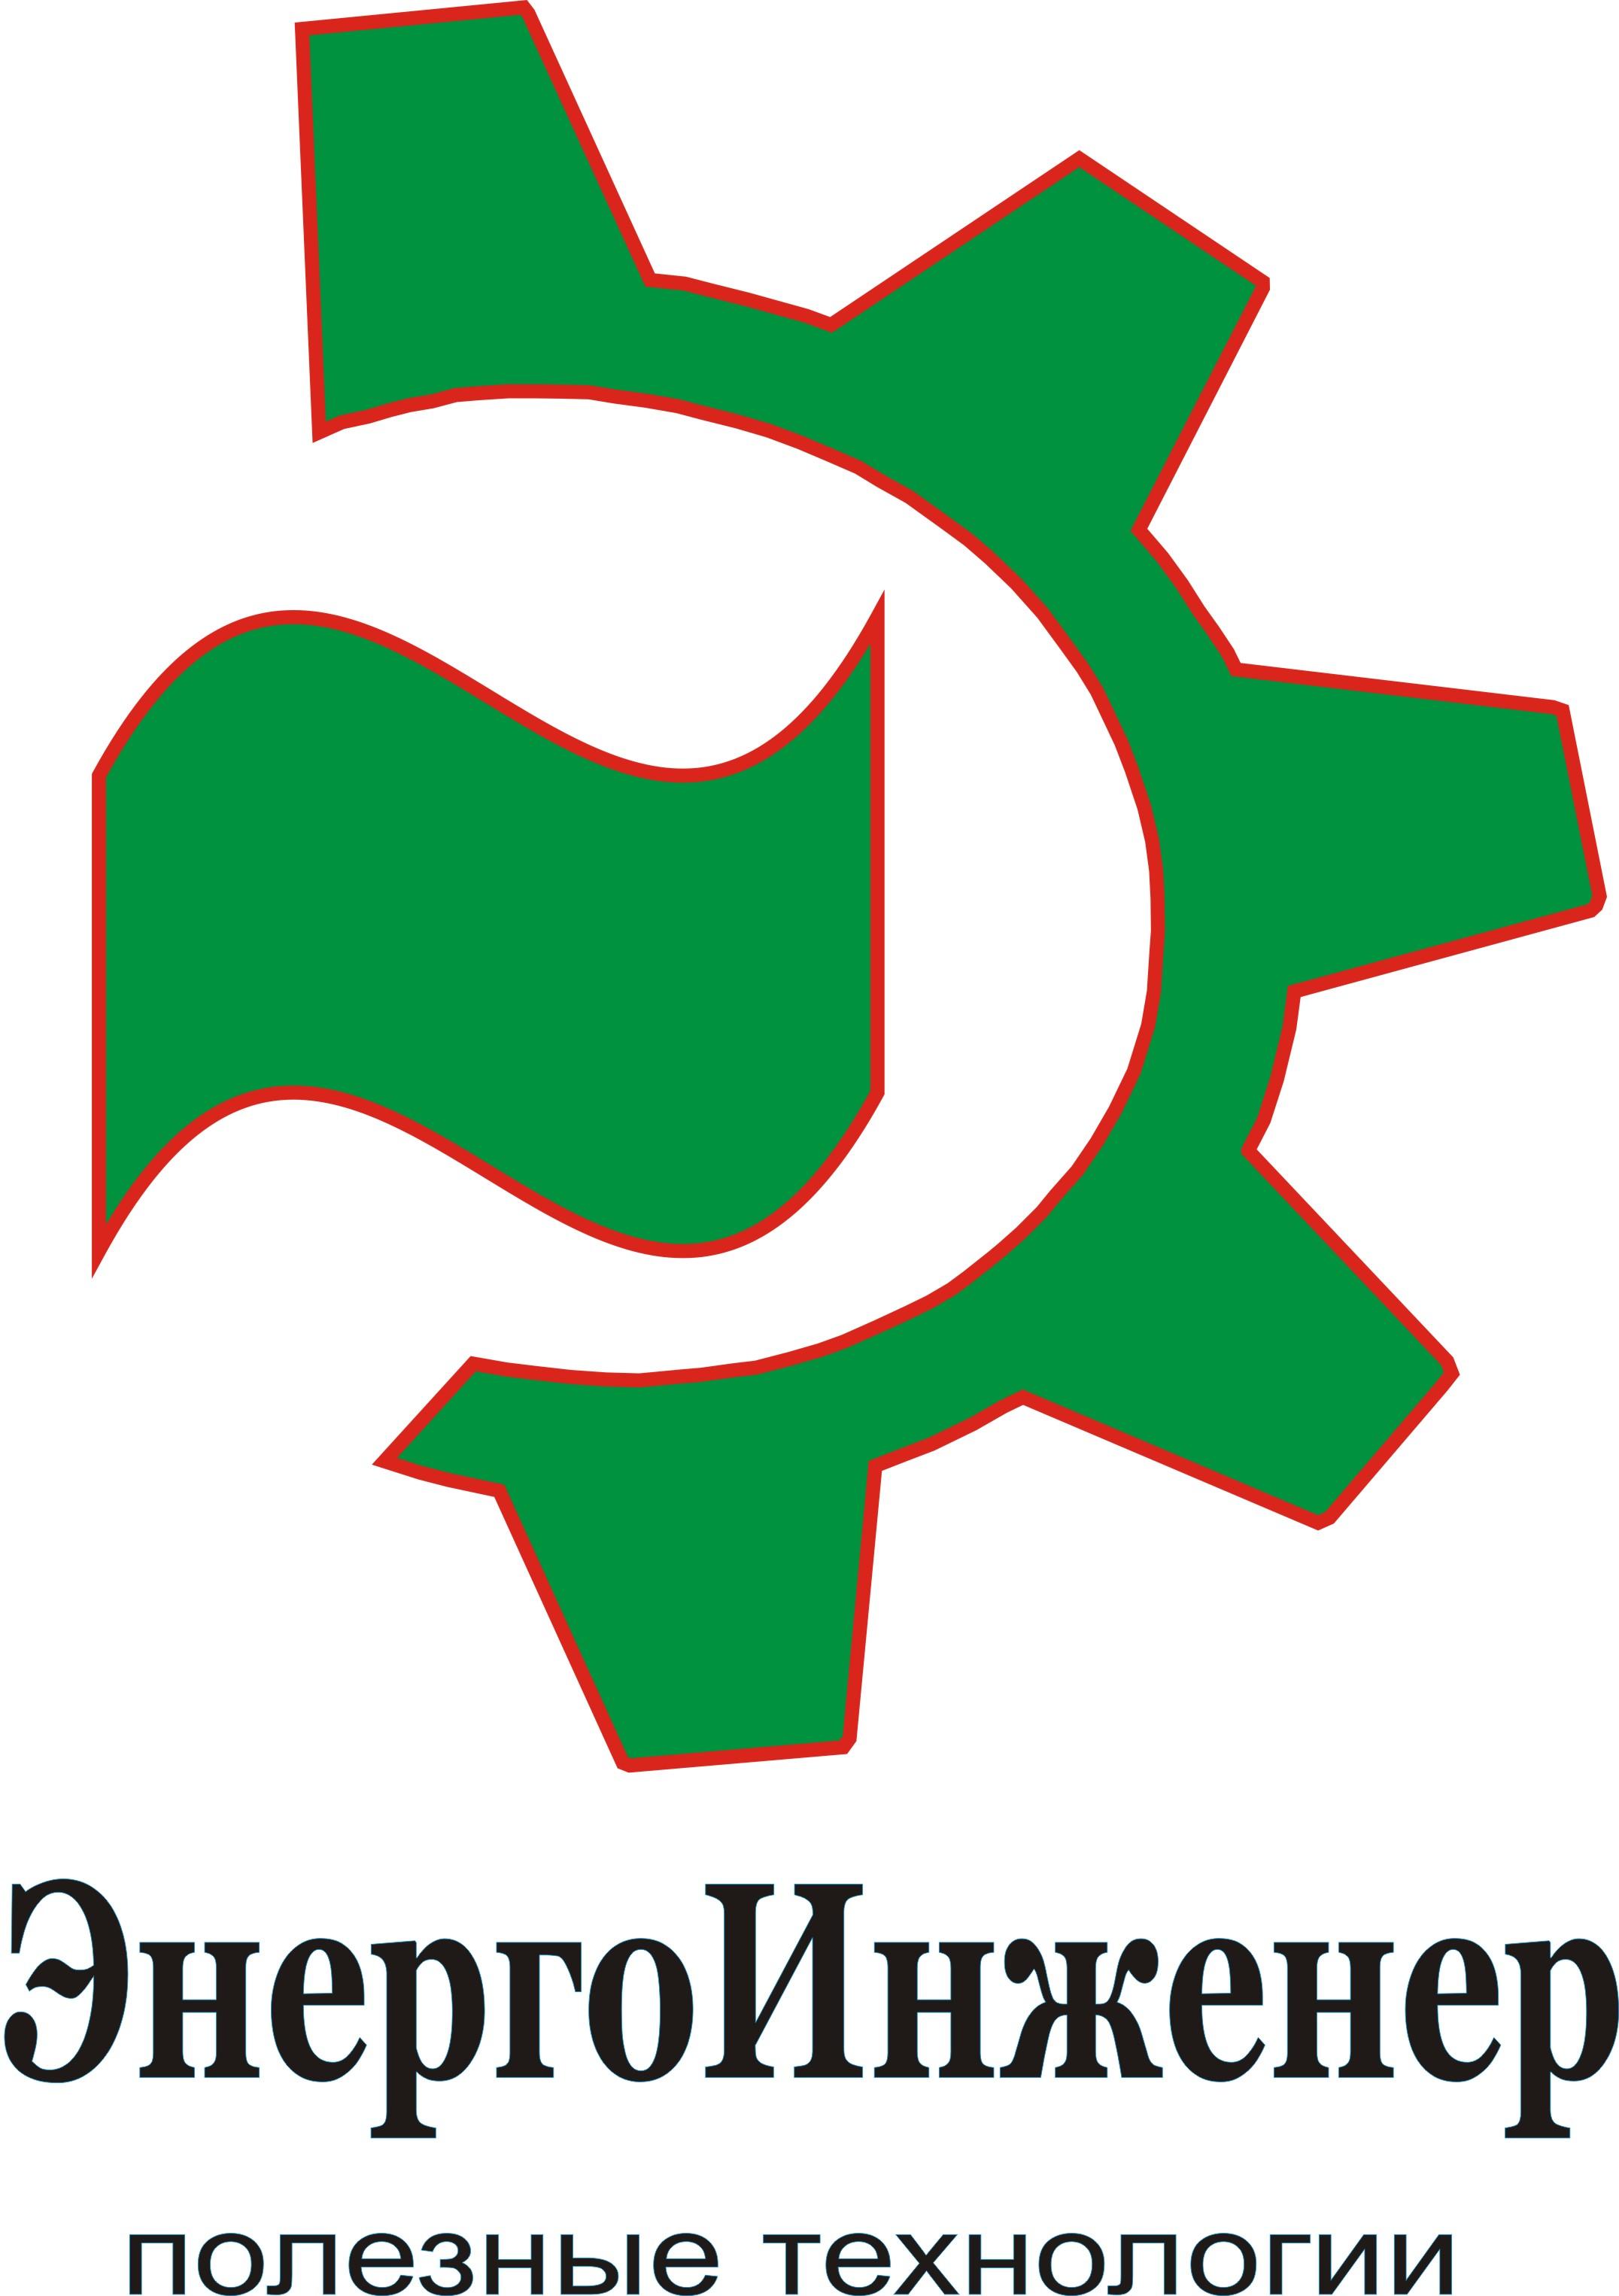 Логотип для инженерной компании фото f_80751e848ab5e91e.jpg